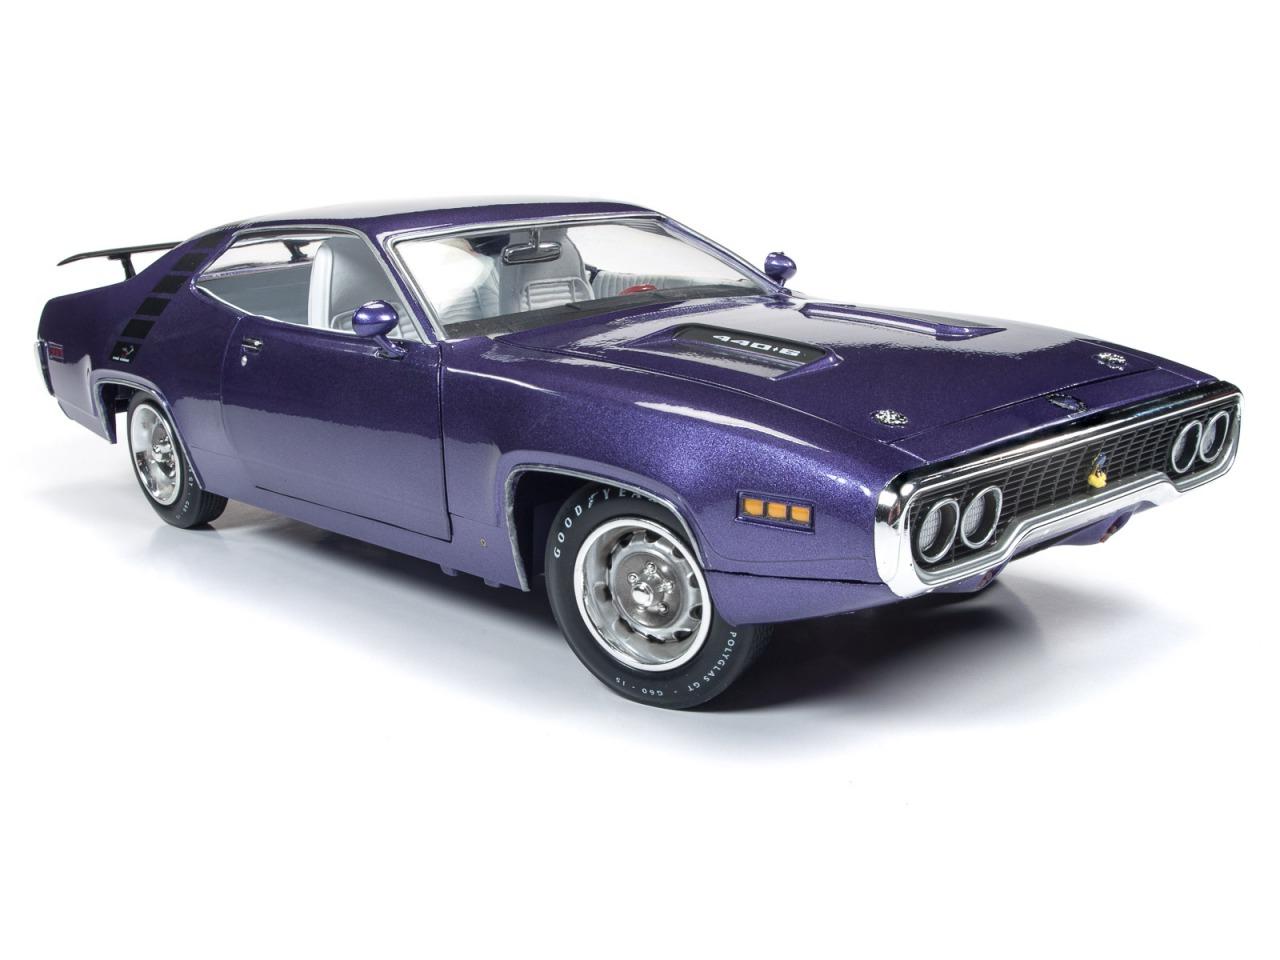 Autoworld オートワールド 1/18 ミニカー ダイキャストモデル 1971年モデル プリムス Road Runner ハードトップ ヴァイオレットカラー1971 Plymouth Road Runner Hardtop (MCACN) in Violet 1:18 Autoworld